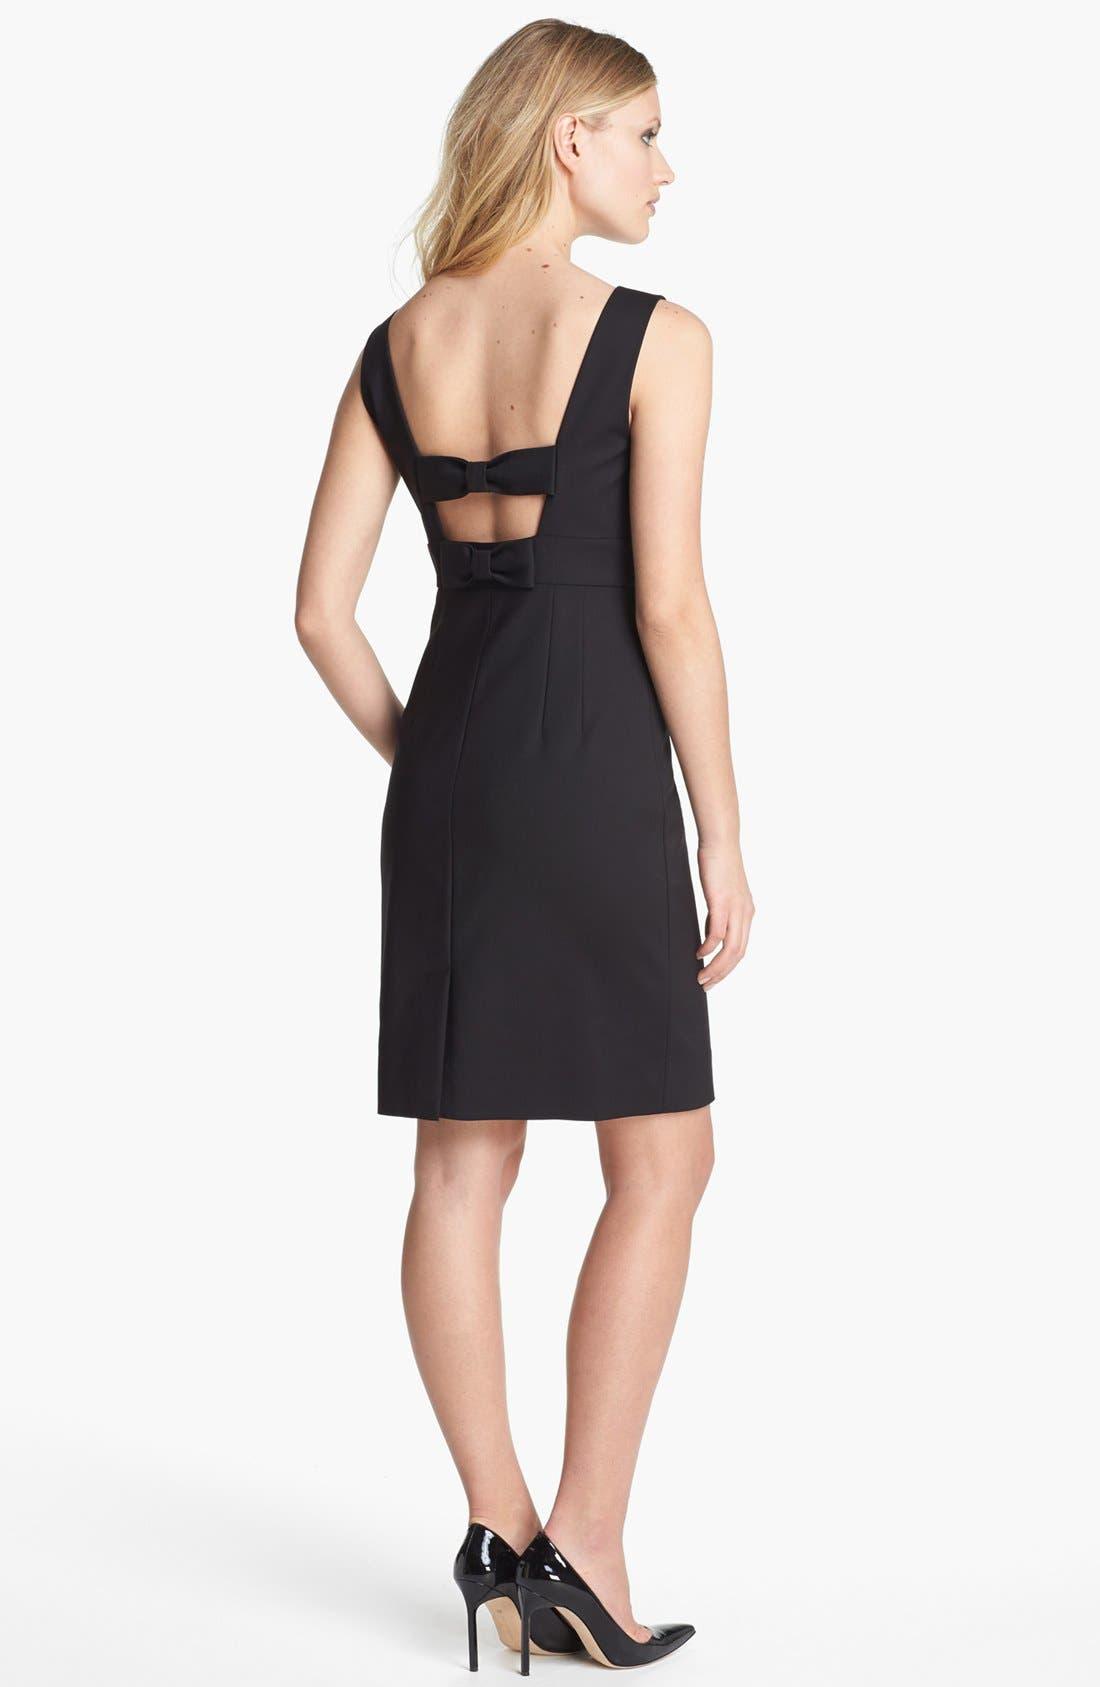 KATE SPADE NEW YORK,                             'joyann' sleeveless dress,                             Alternate thumbnail 3, color,                             001